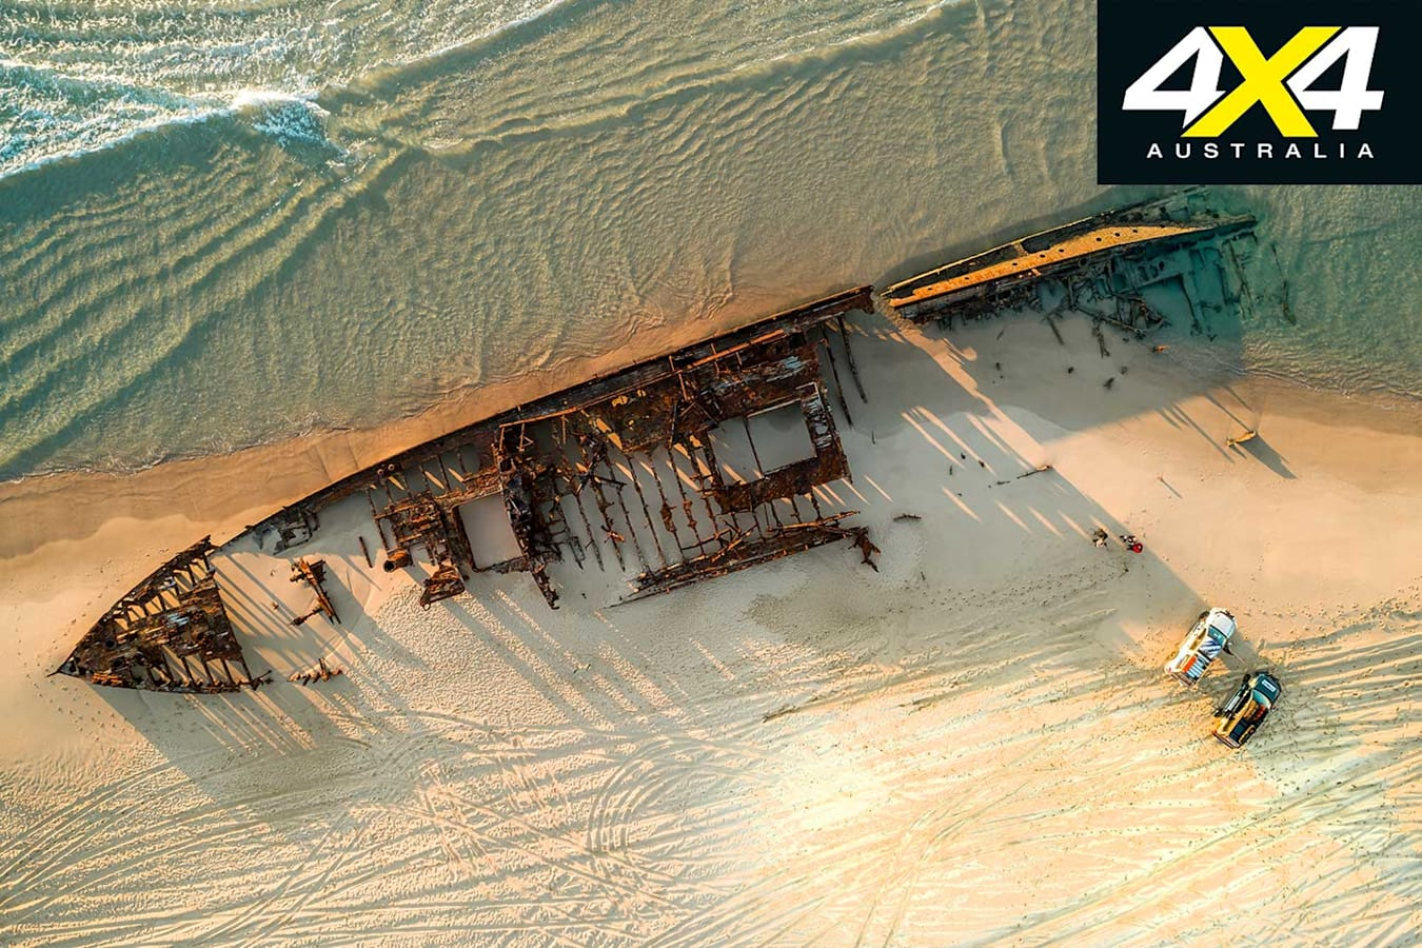 4 X 4 Adventure Series South East Queensland Part 2 Maheno Wreck Jpg